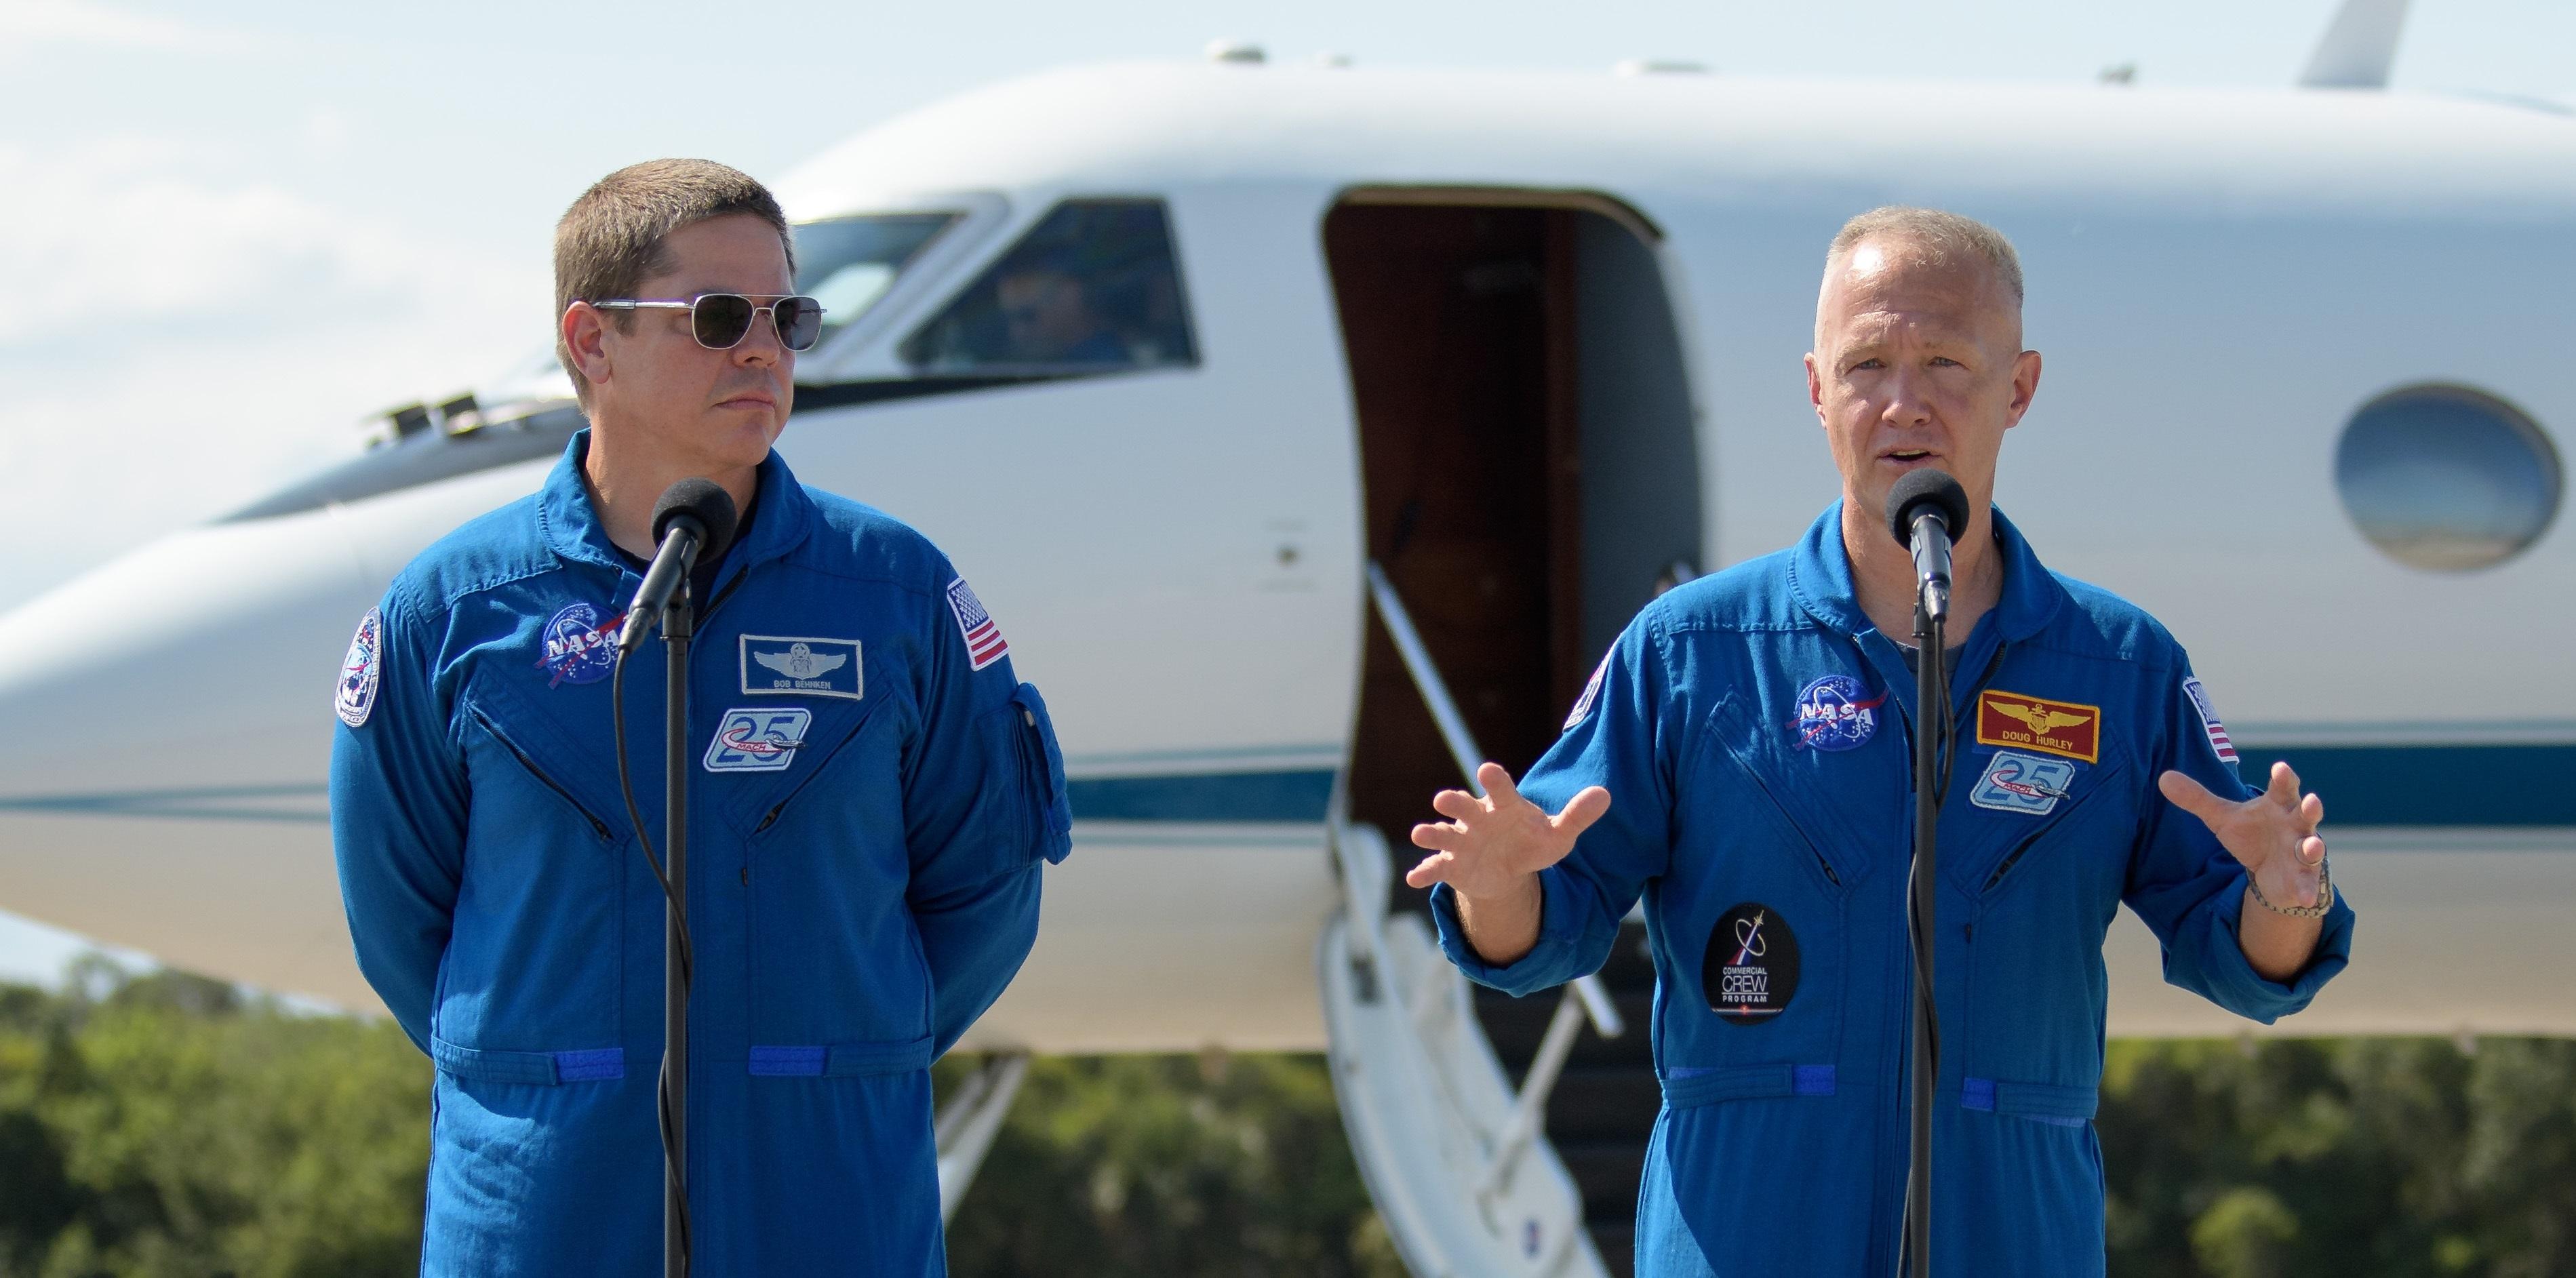 Astronautas llegan a Florida